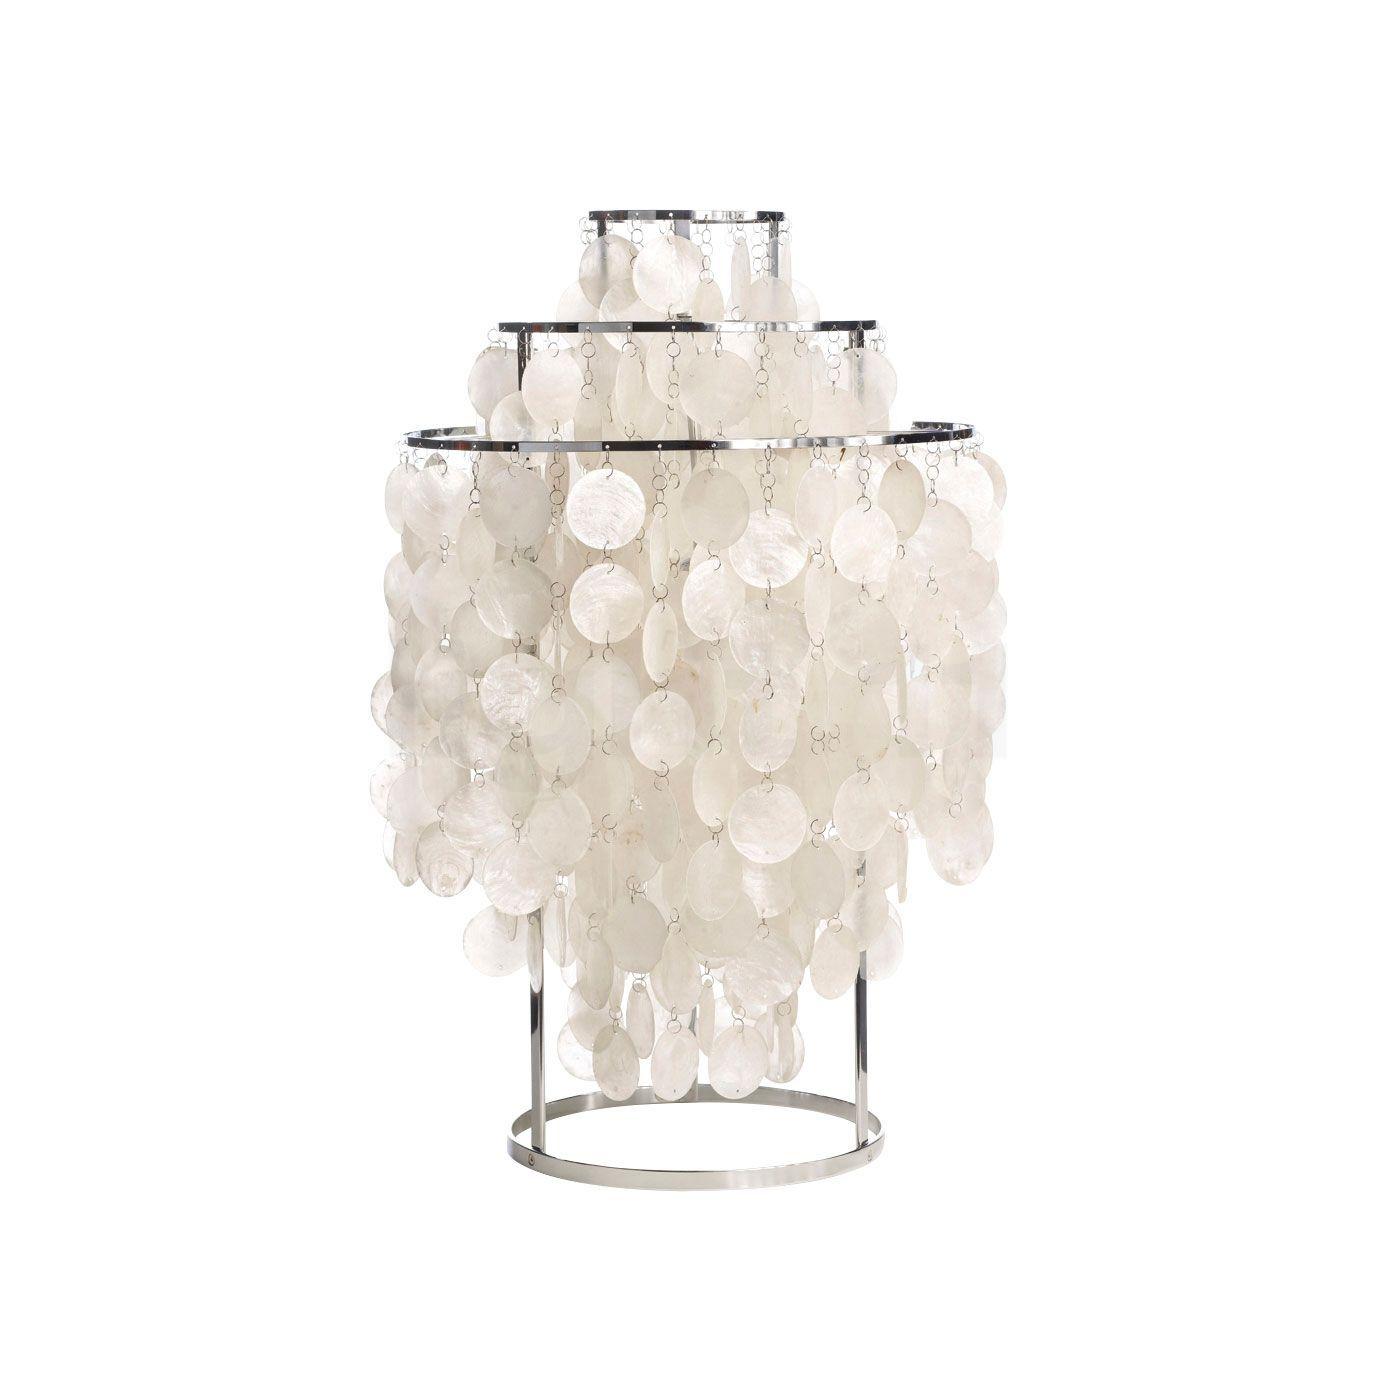 Verpan Fun 1TM Lampe de table, blanc nacré